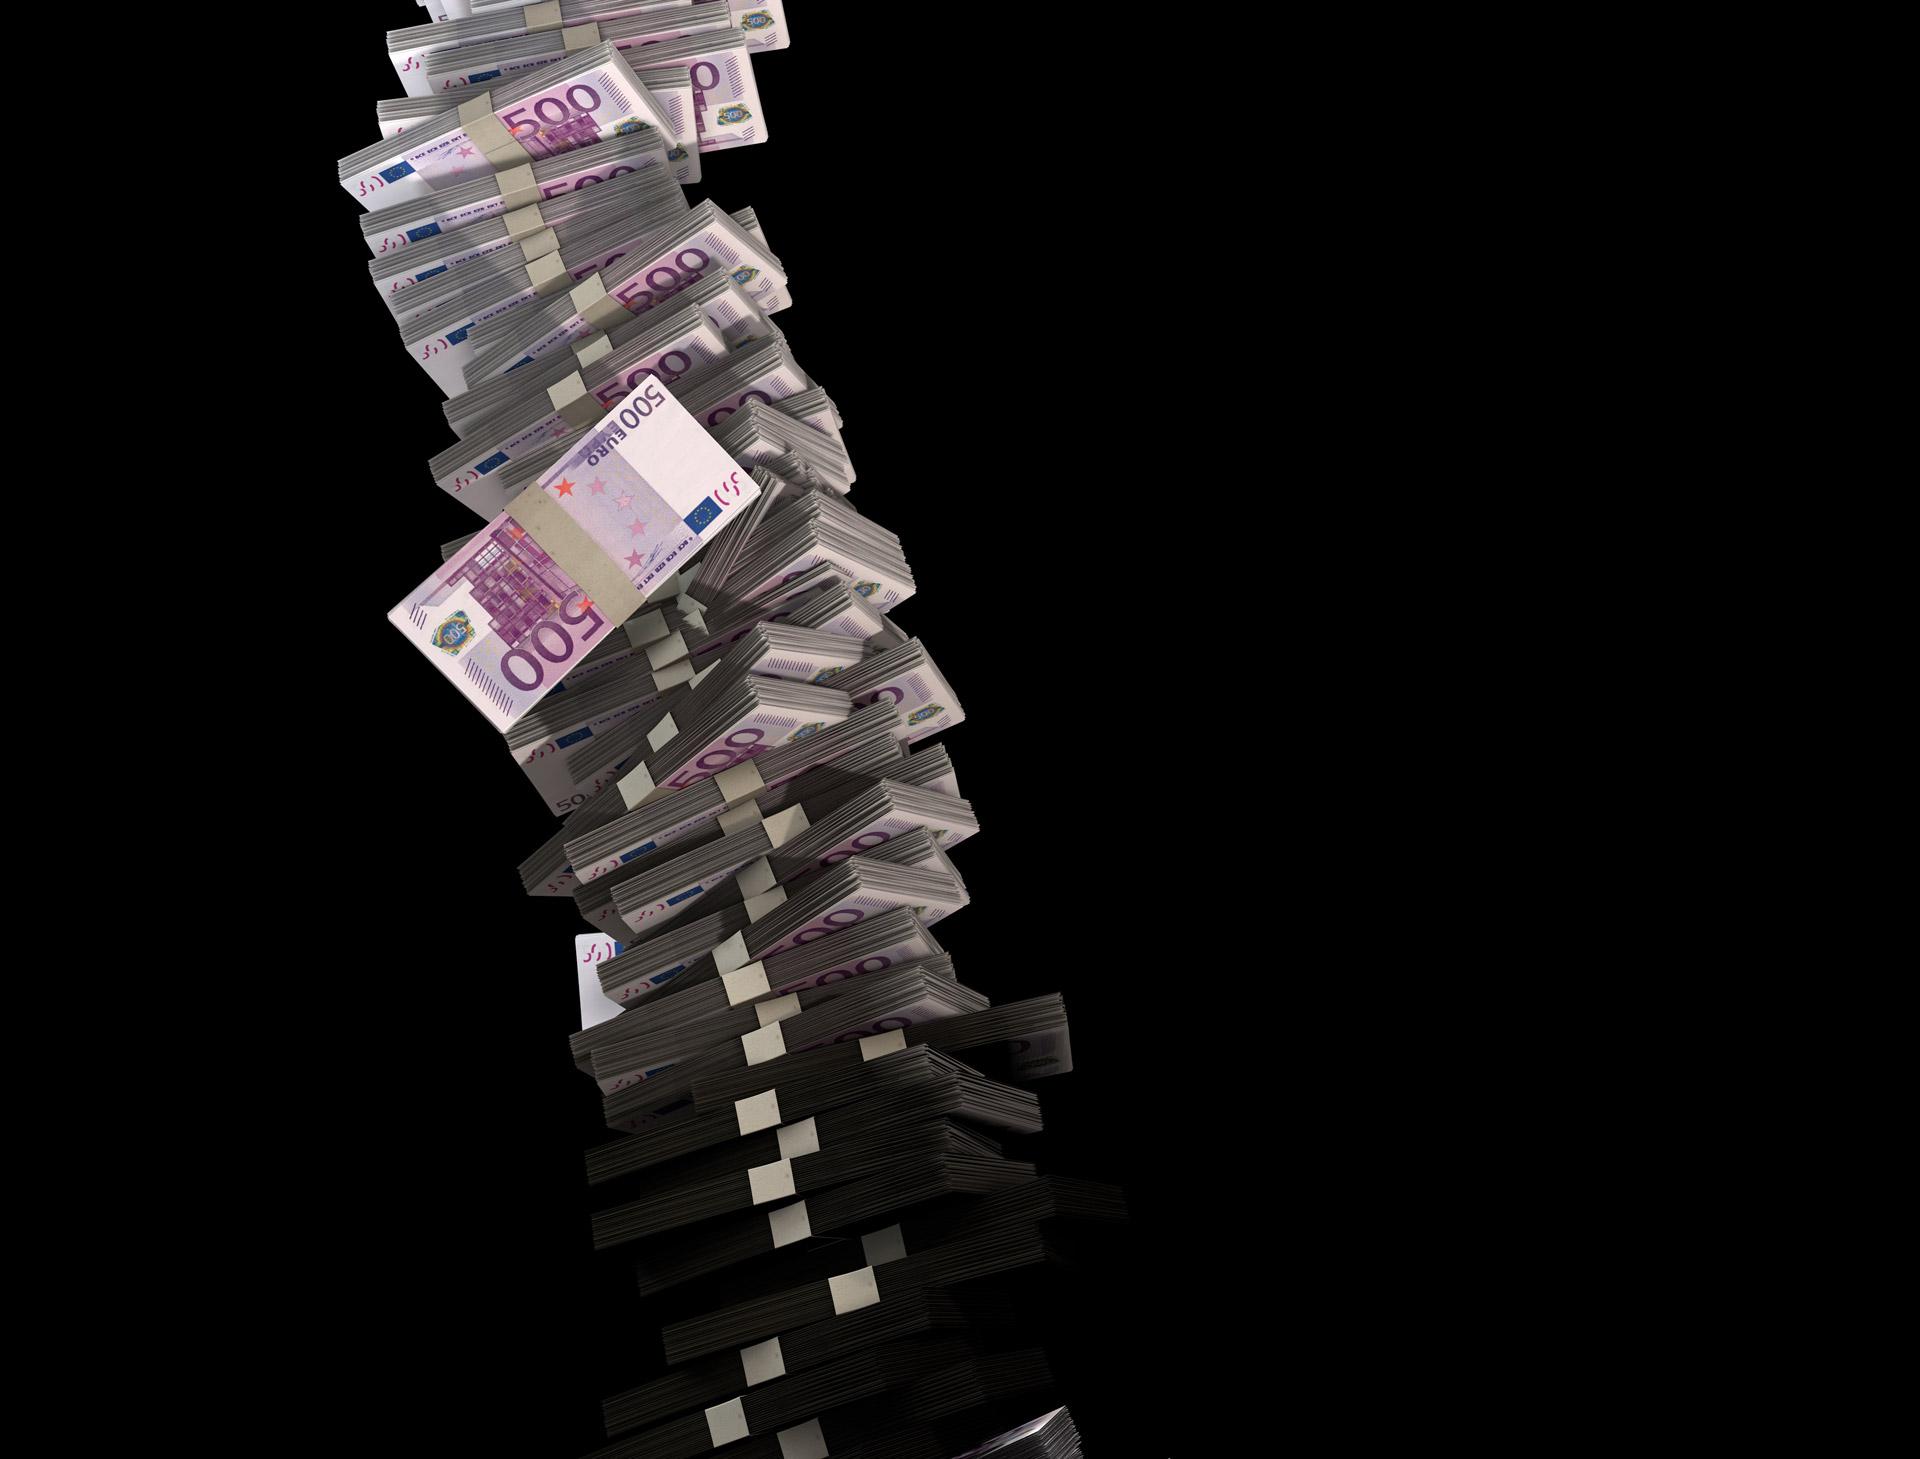 Tower Of 500 Euro Money Free Stock Photo